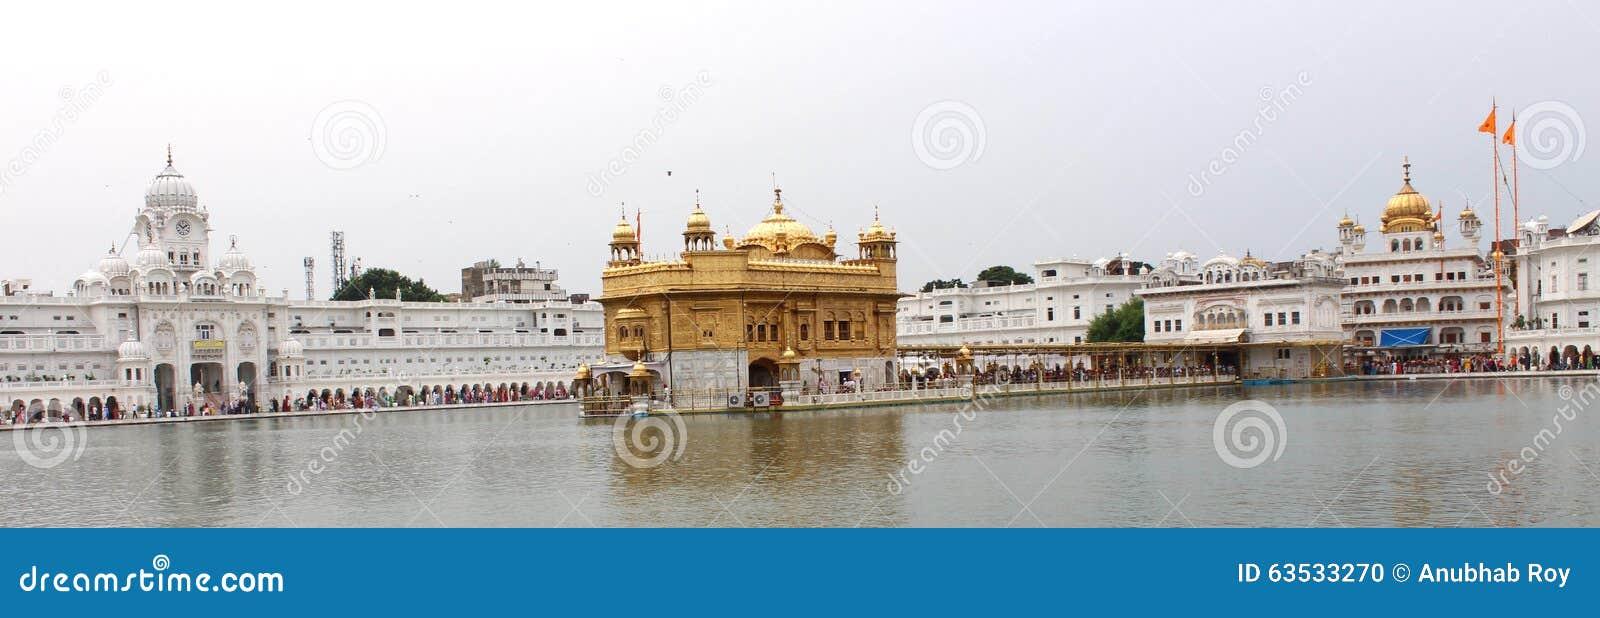 Guru Ram Das Meaning Satnam Sri Waheguru February 2014 Gurbani Jithe Jae Bahe Mera Satgur Read